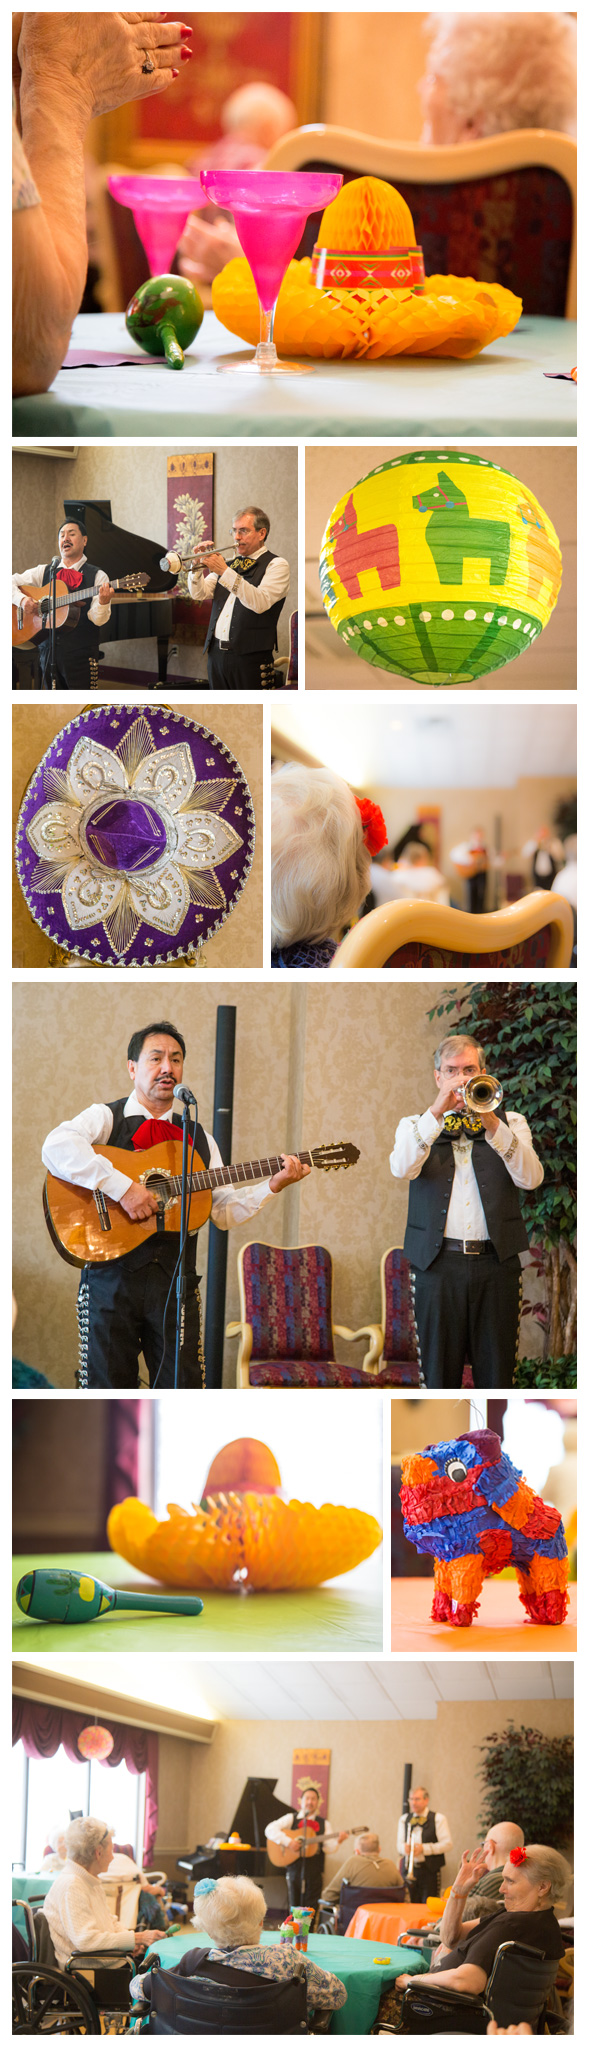 Photo of Westview celebration of Cinco de Mayo